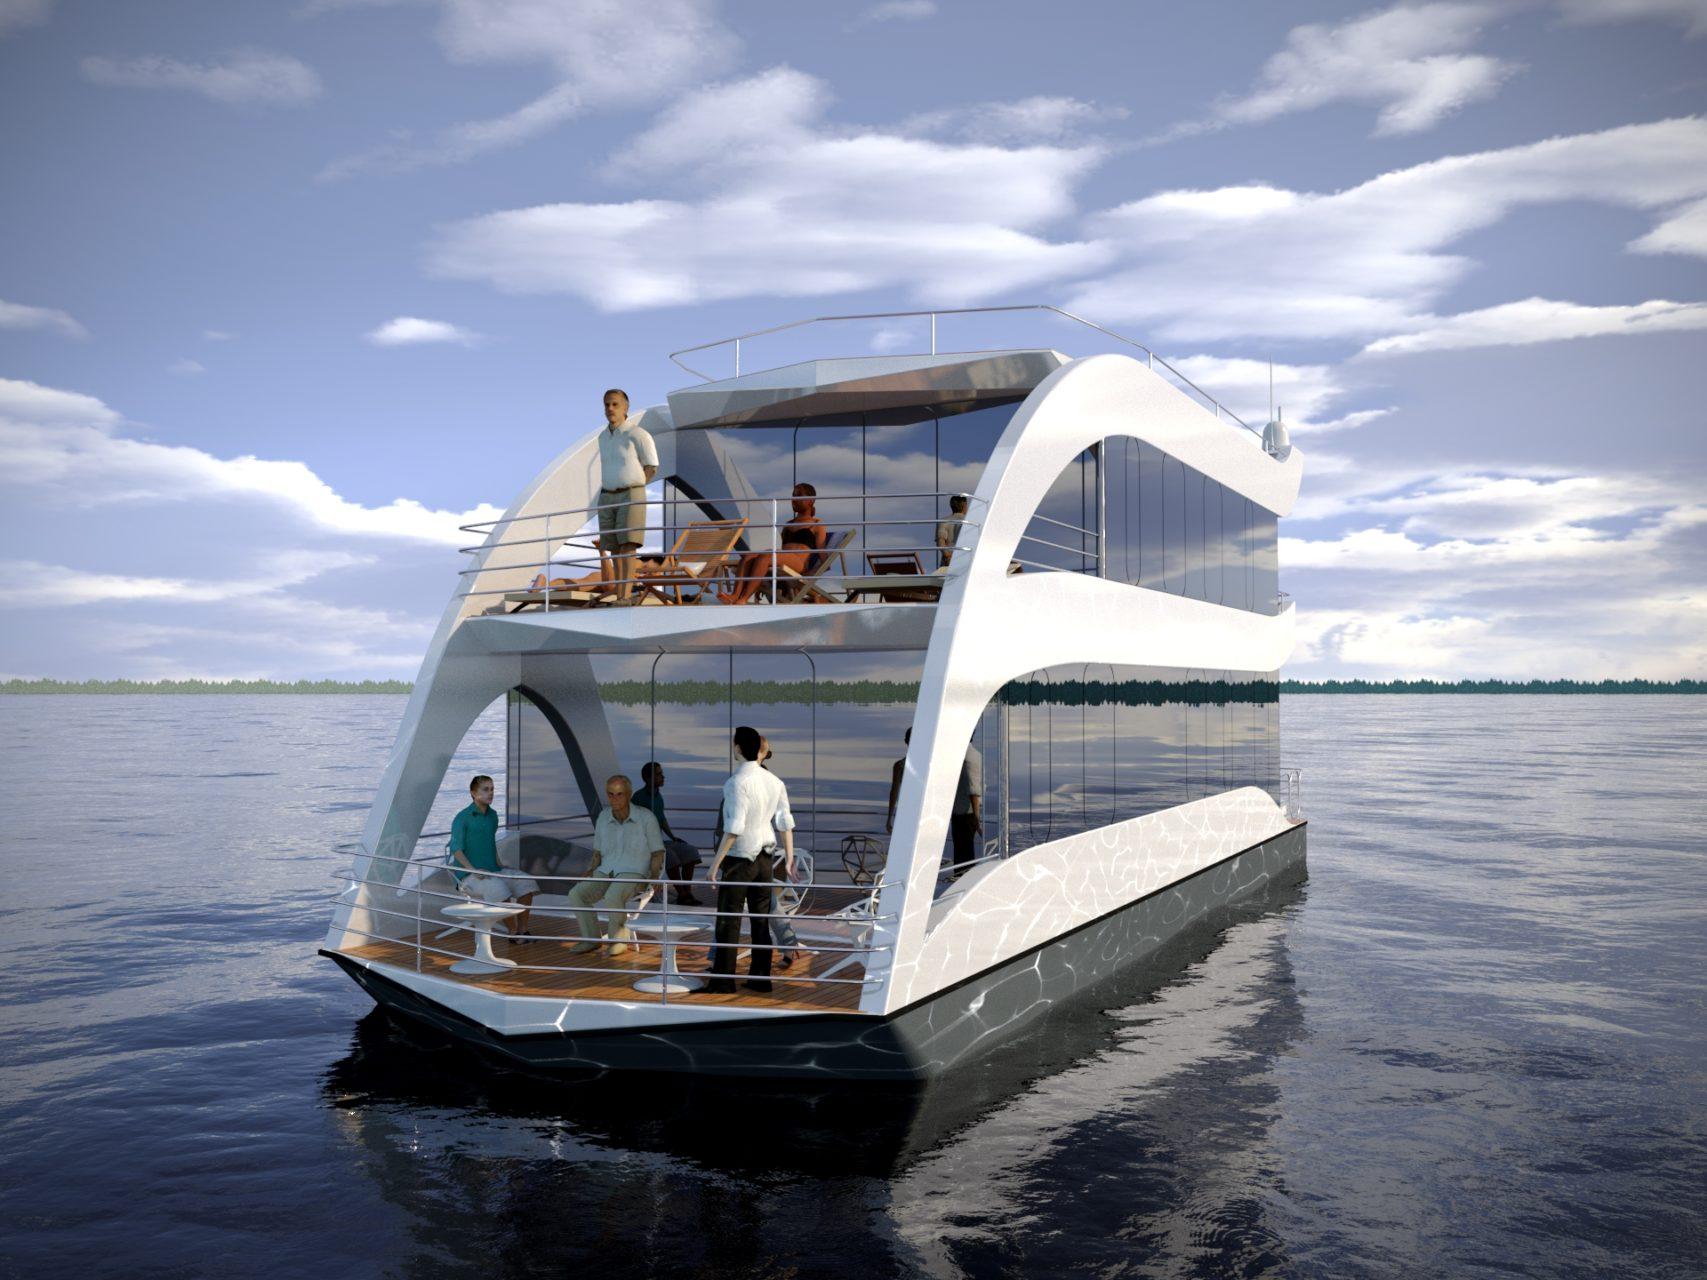 http://houseboat.ru/wp-content/uploads/2016/09/180109_01.jpg